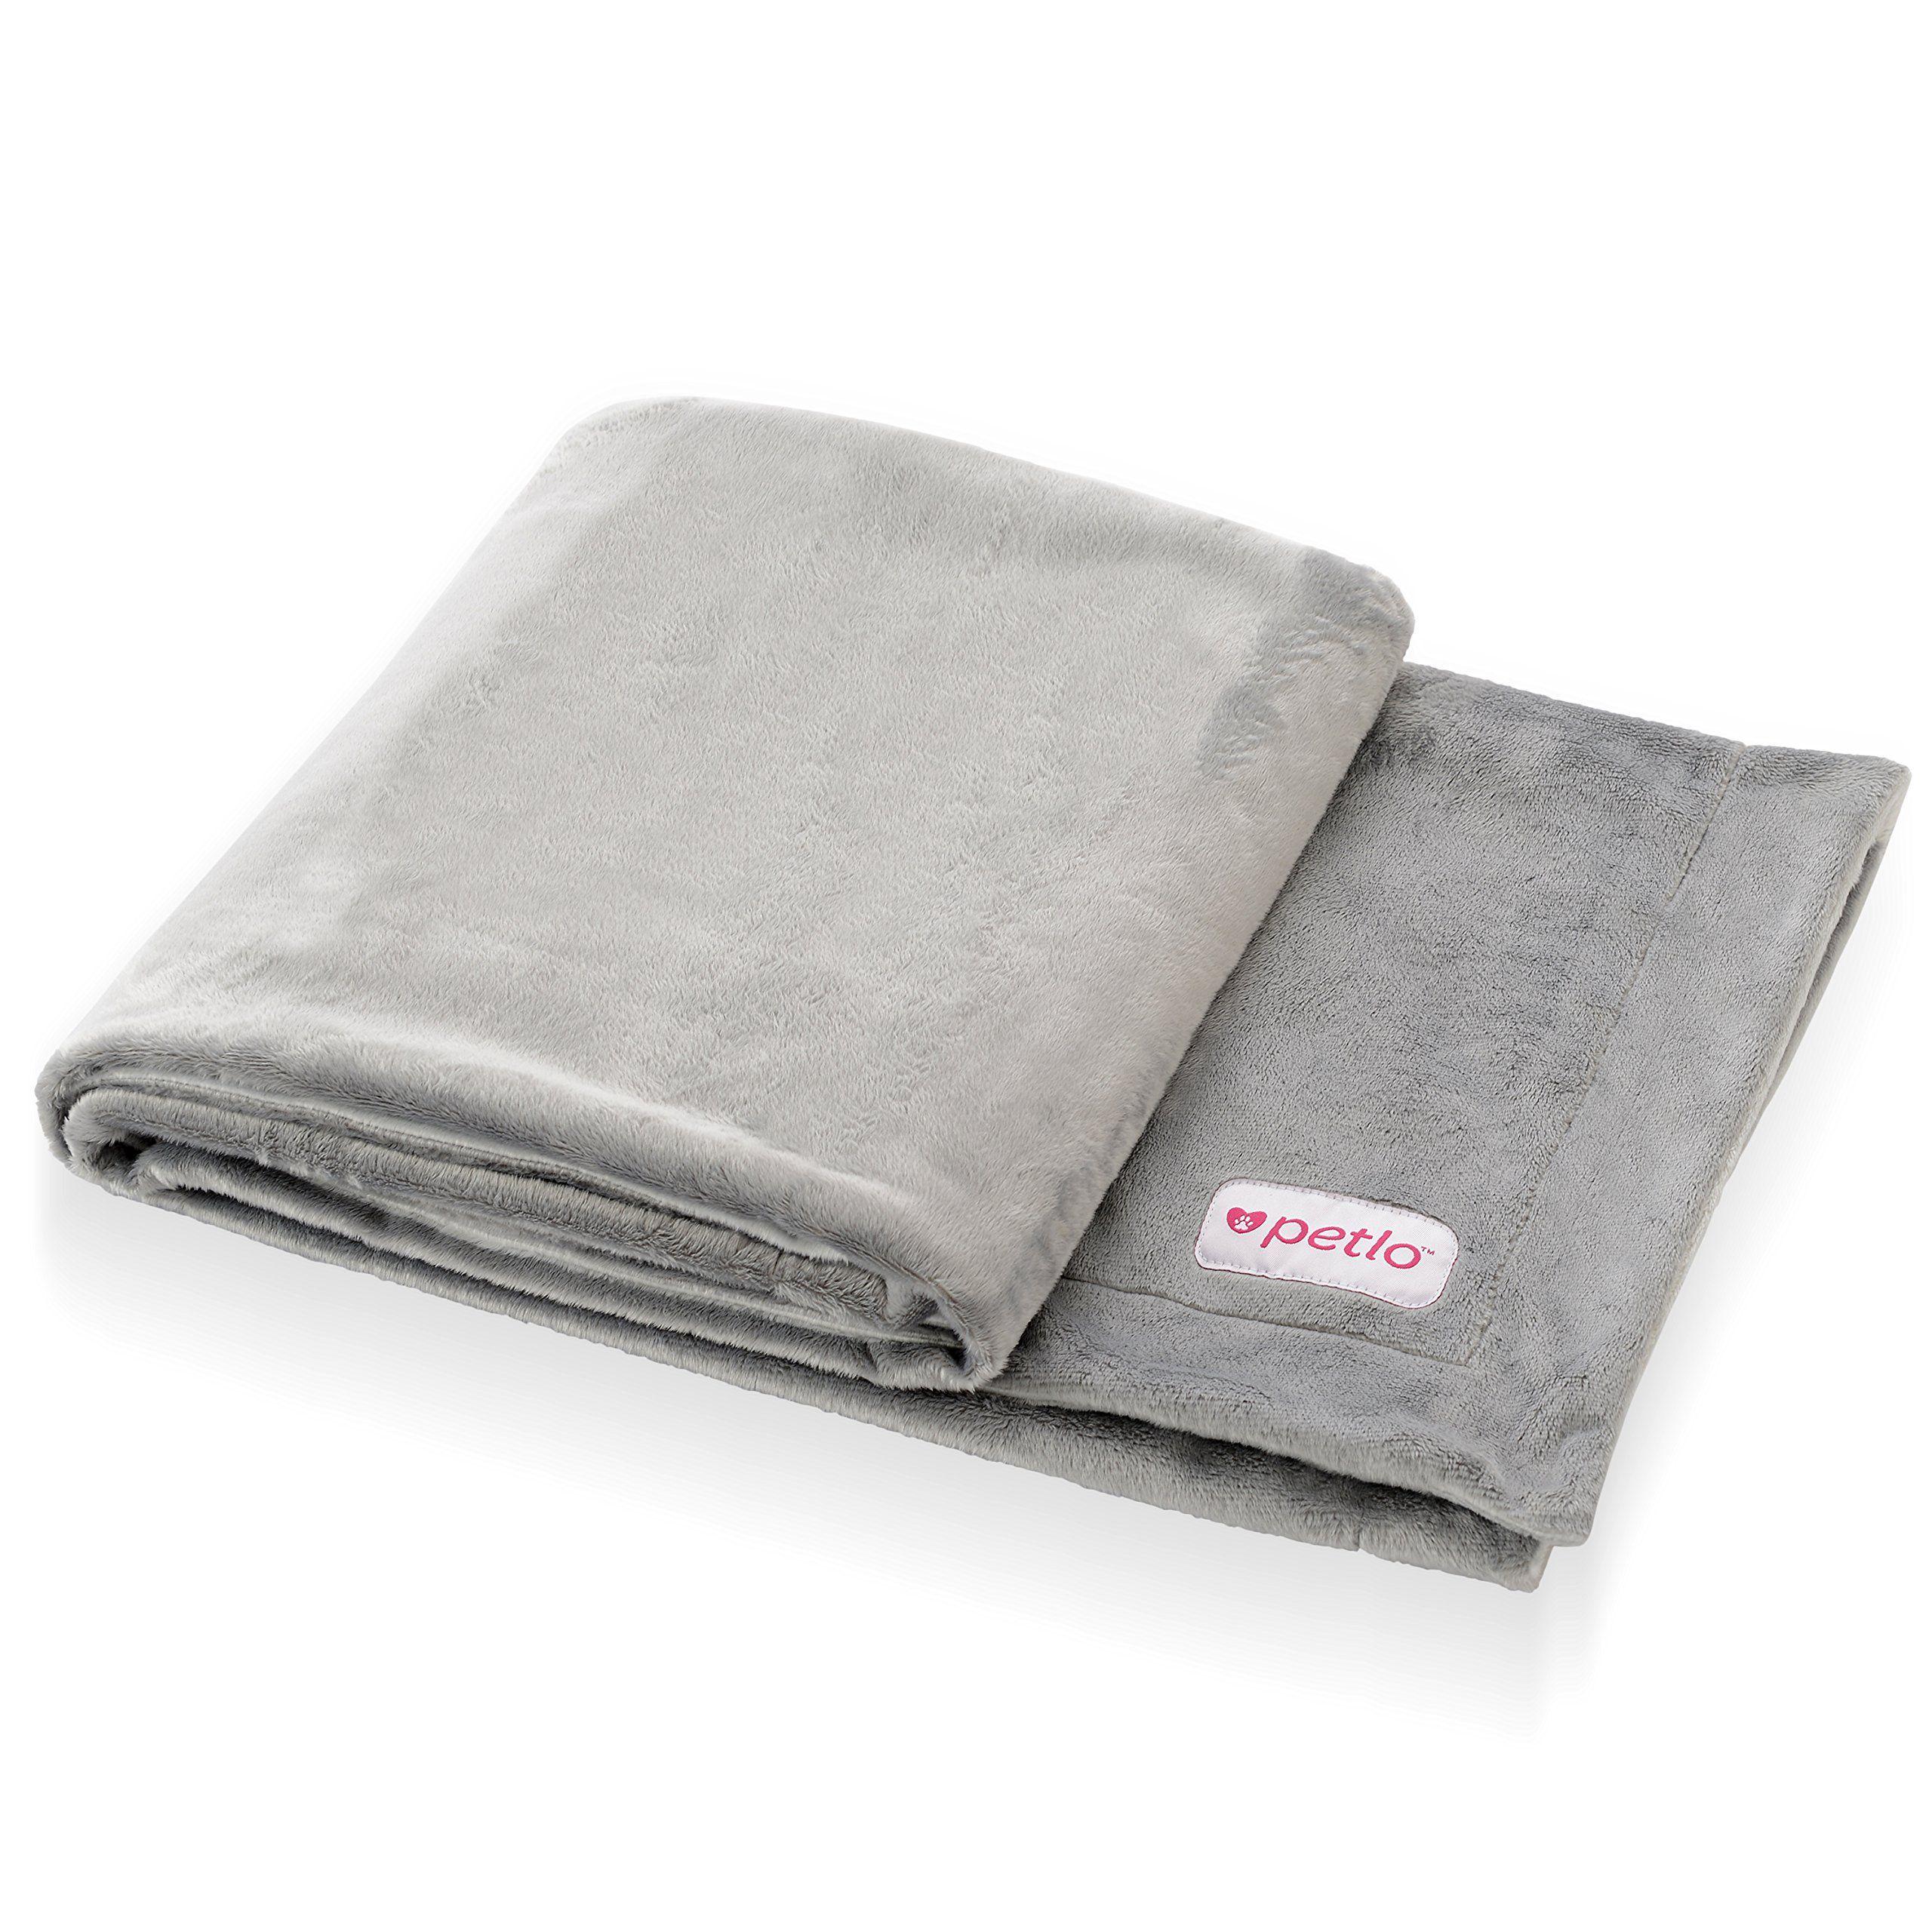 Soft Fleece Dog and Pet Blanket Extra Comfortable Reversible Velour